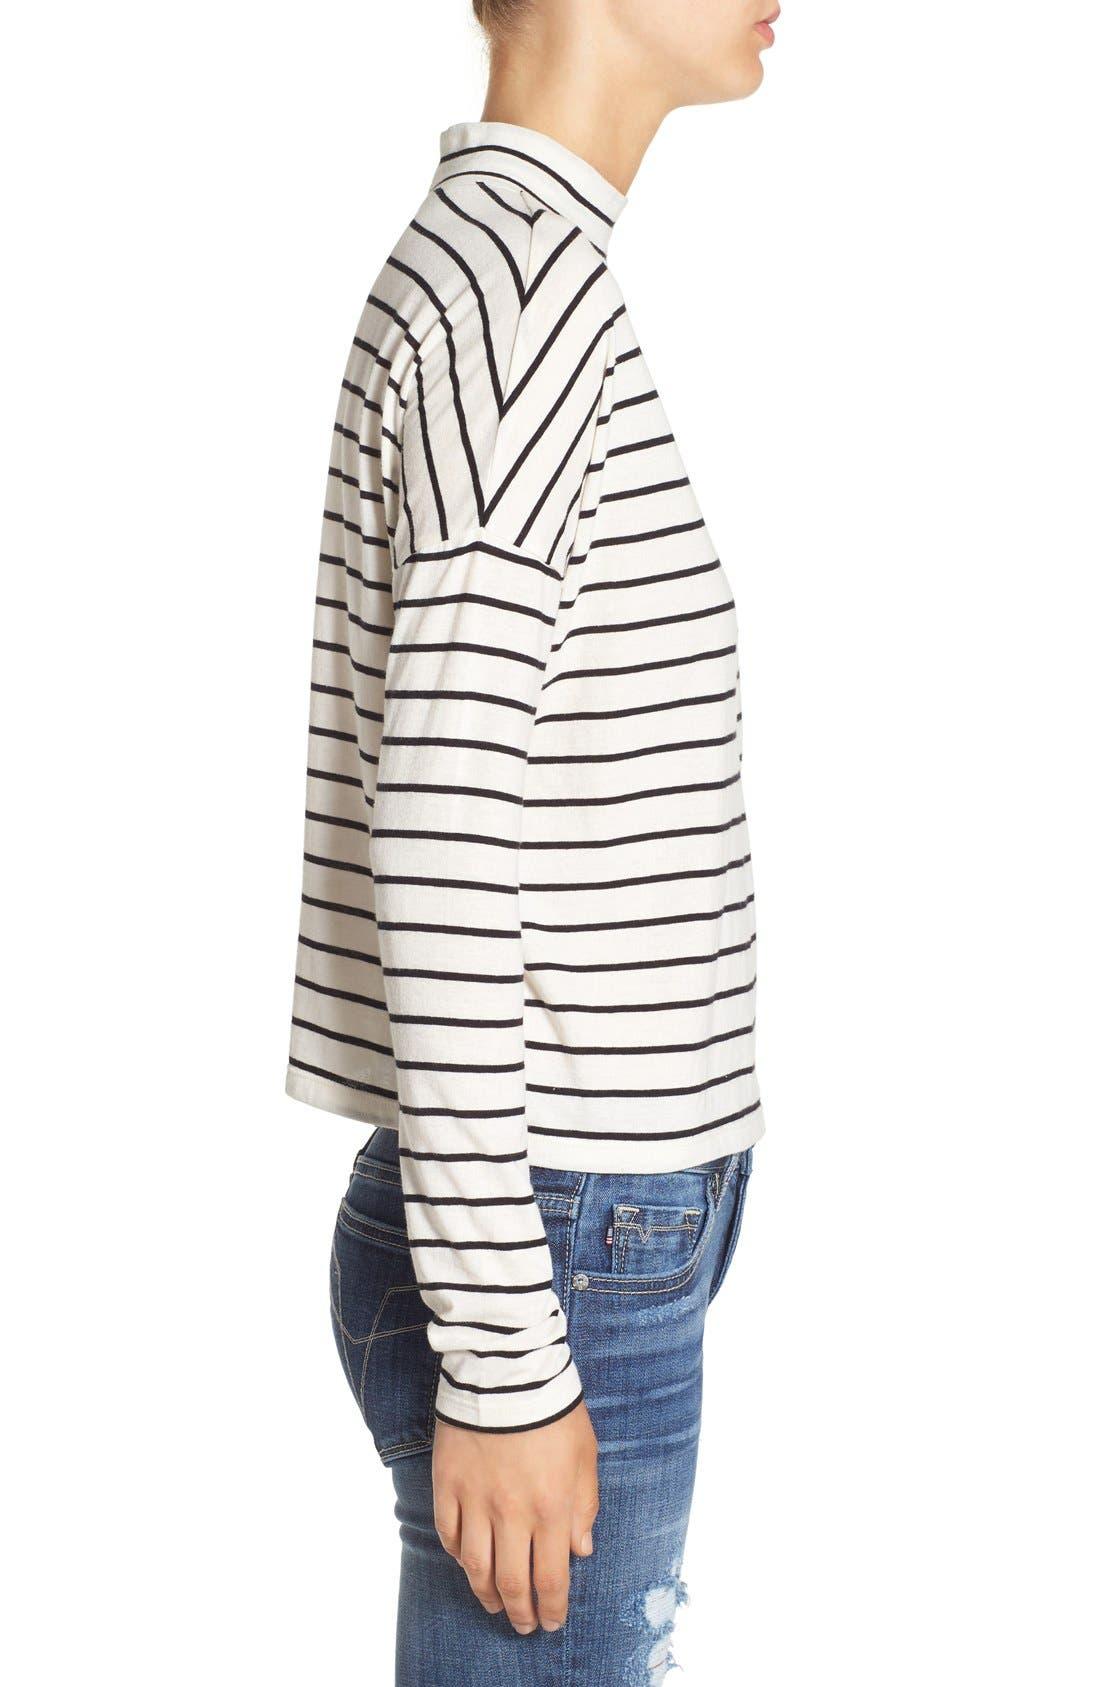 BP., Stripe Long Sleeve Mock Neck Tee, Alternate thumbnail 2, color, 900